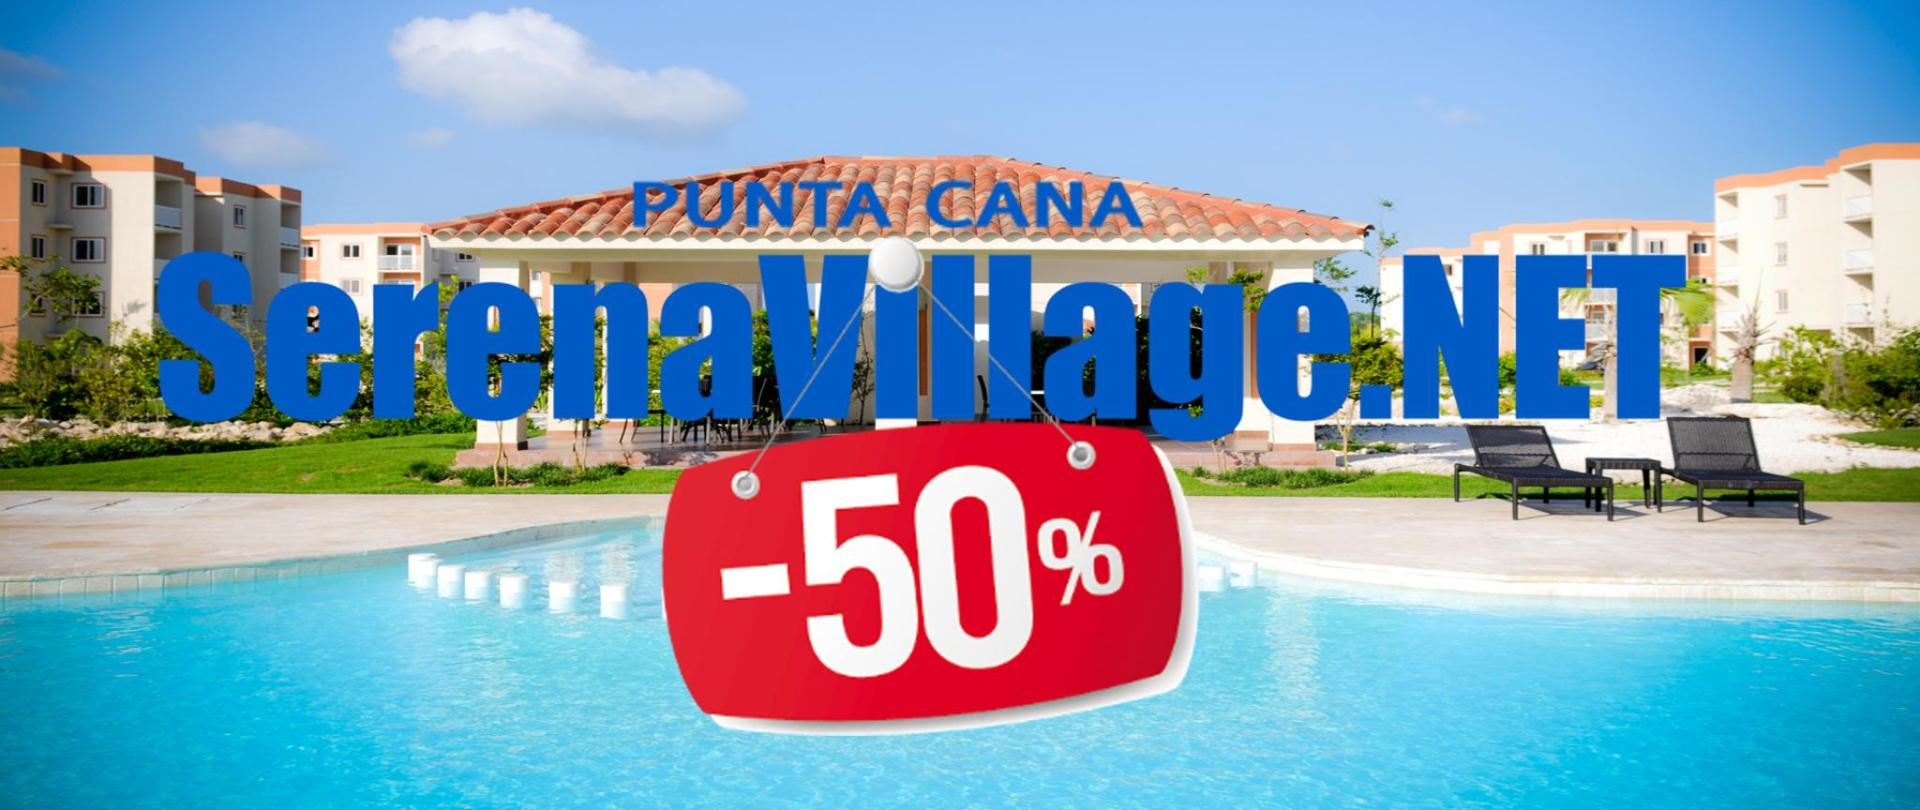 Serena Village Punta Cana.jpg